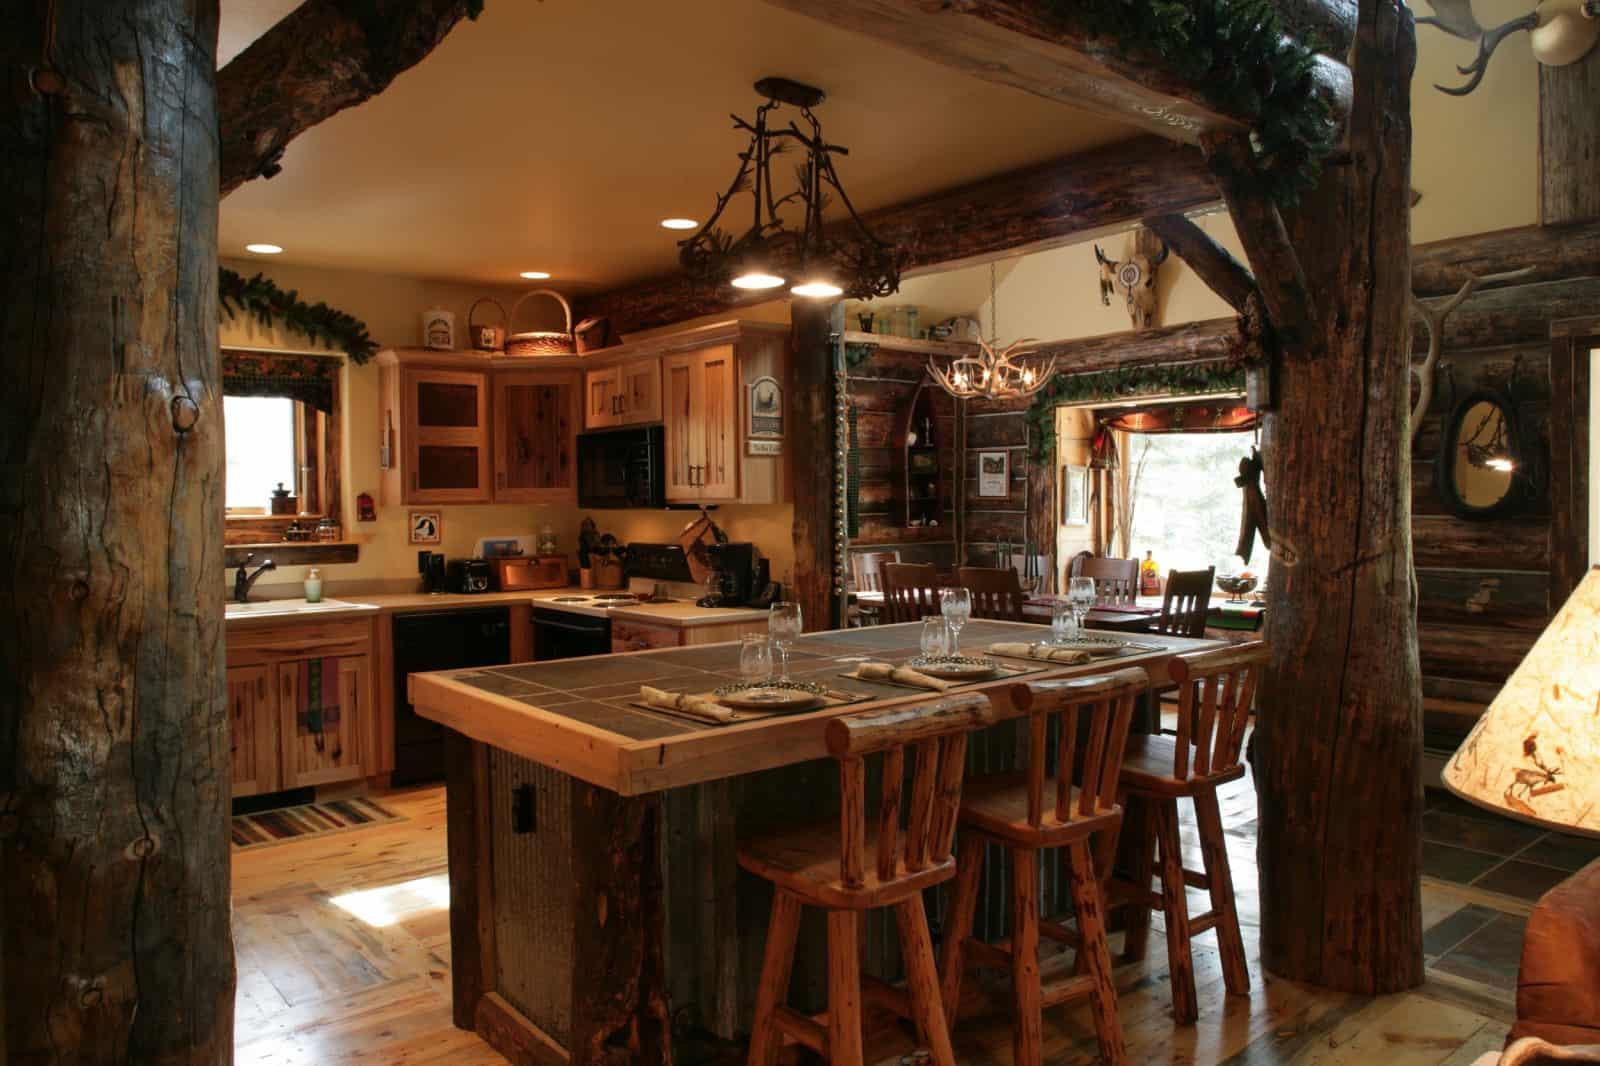 Rustic Kitchen Accessories  Interior design trends 2017 Rustic kitchen decor – HOUSE